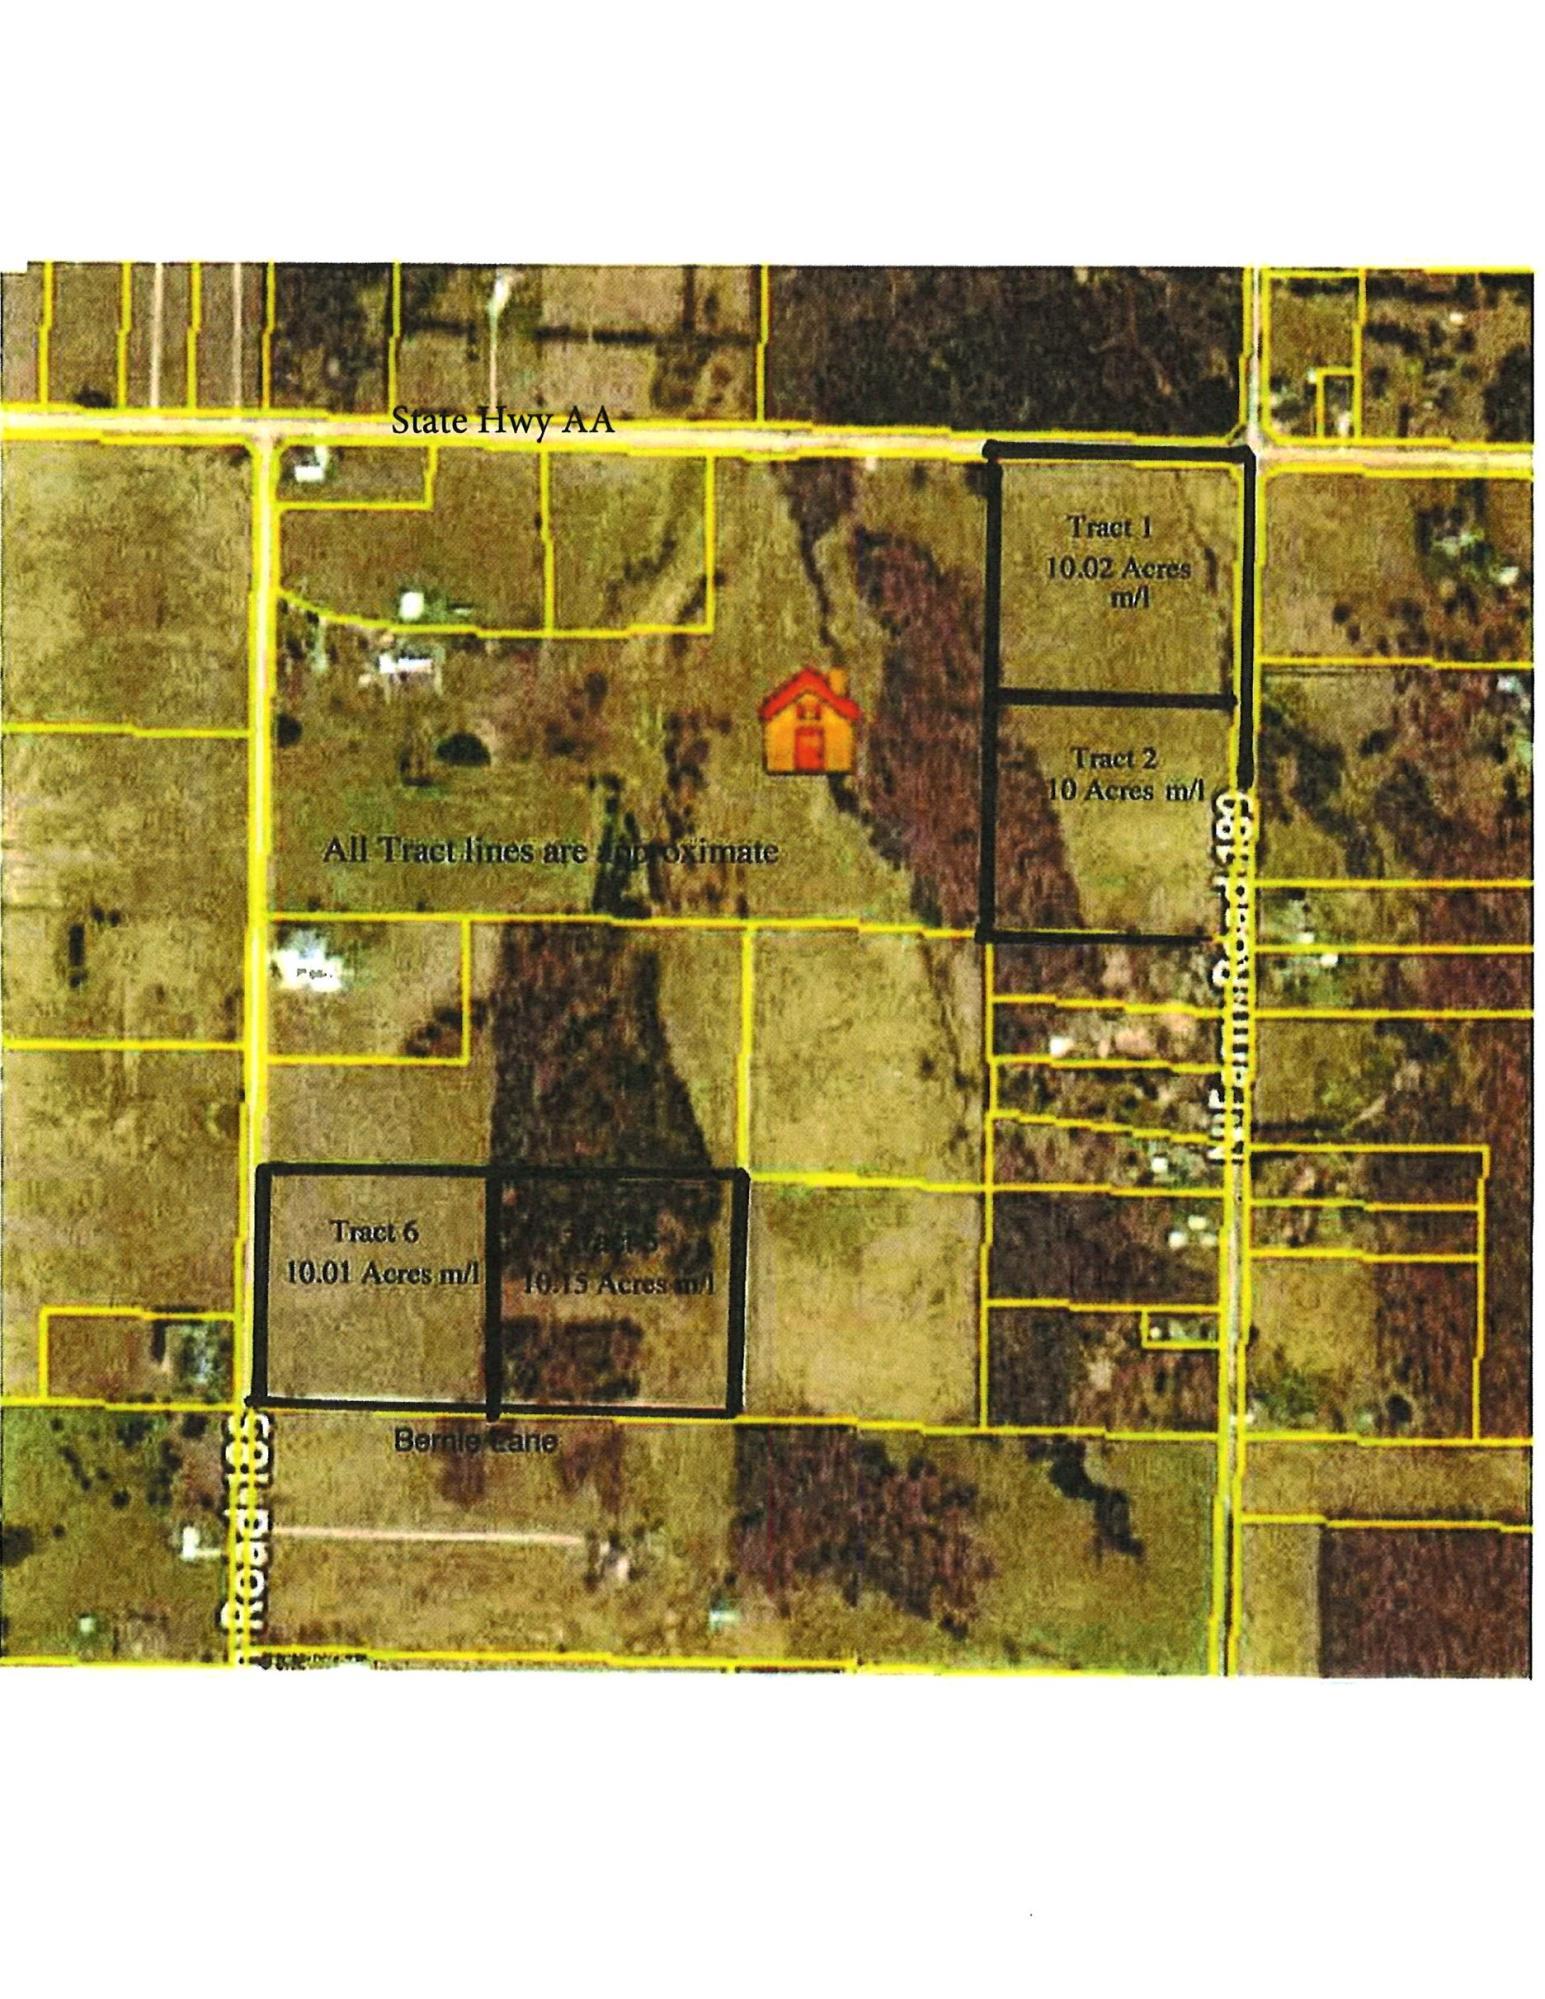 T 6 North Farm Road 185 Springfield, MO 65803